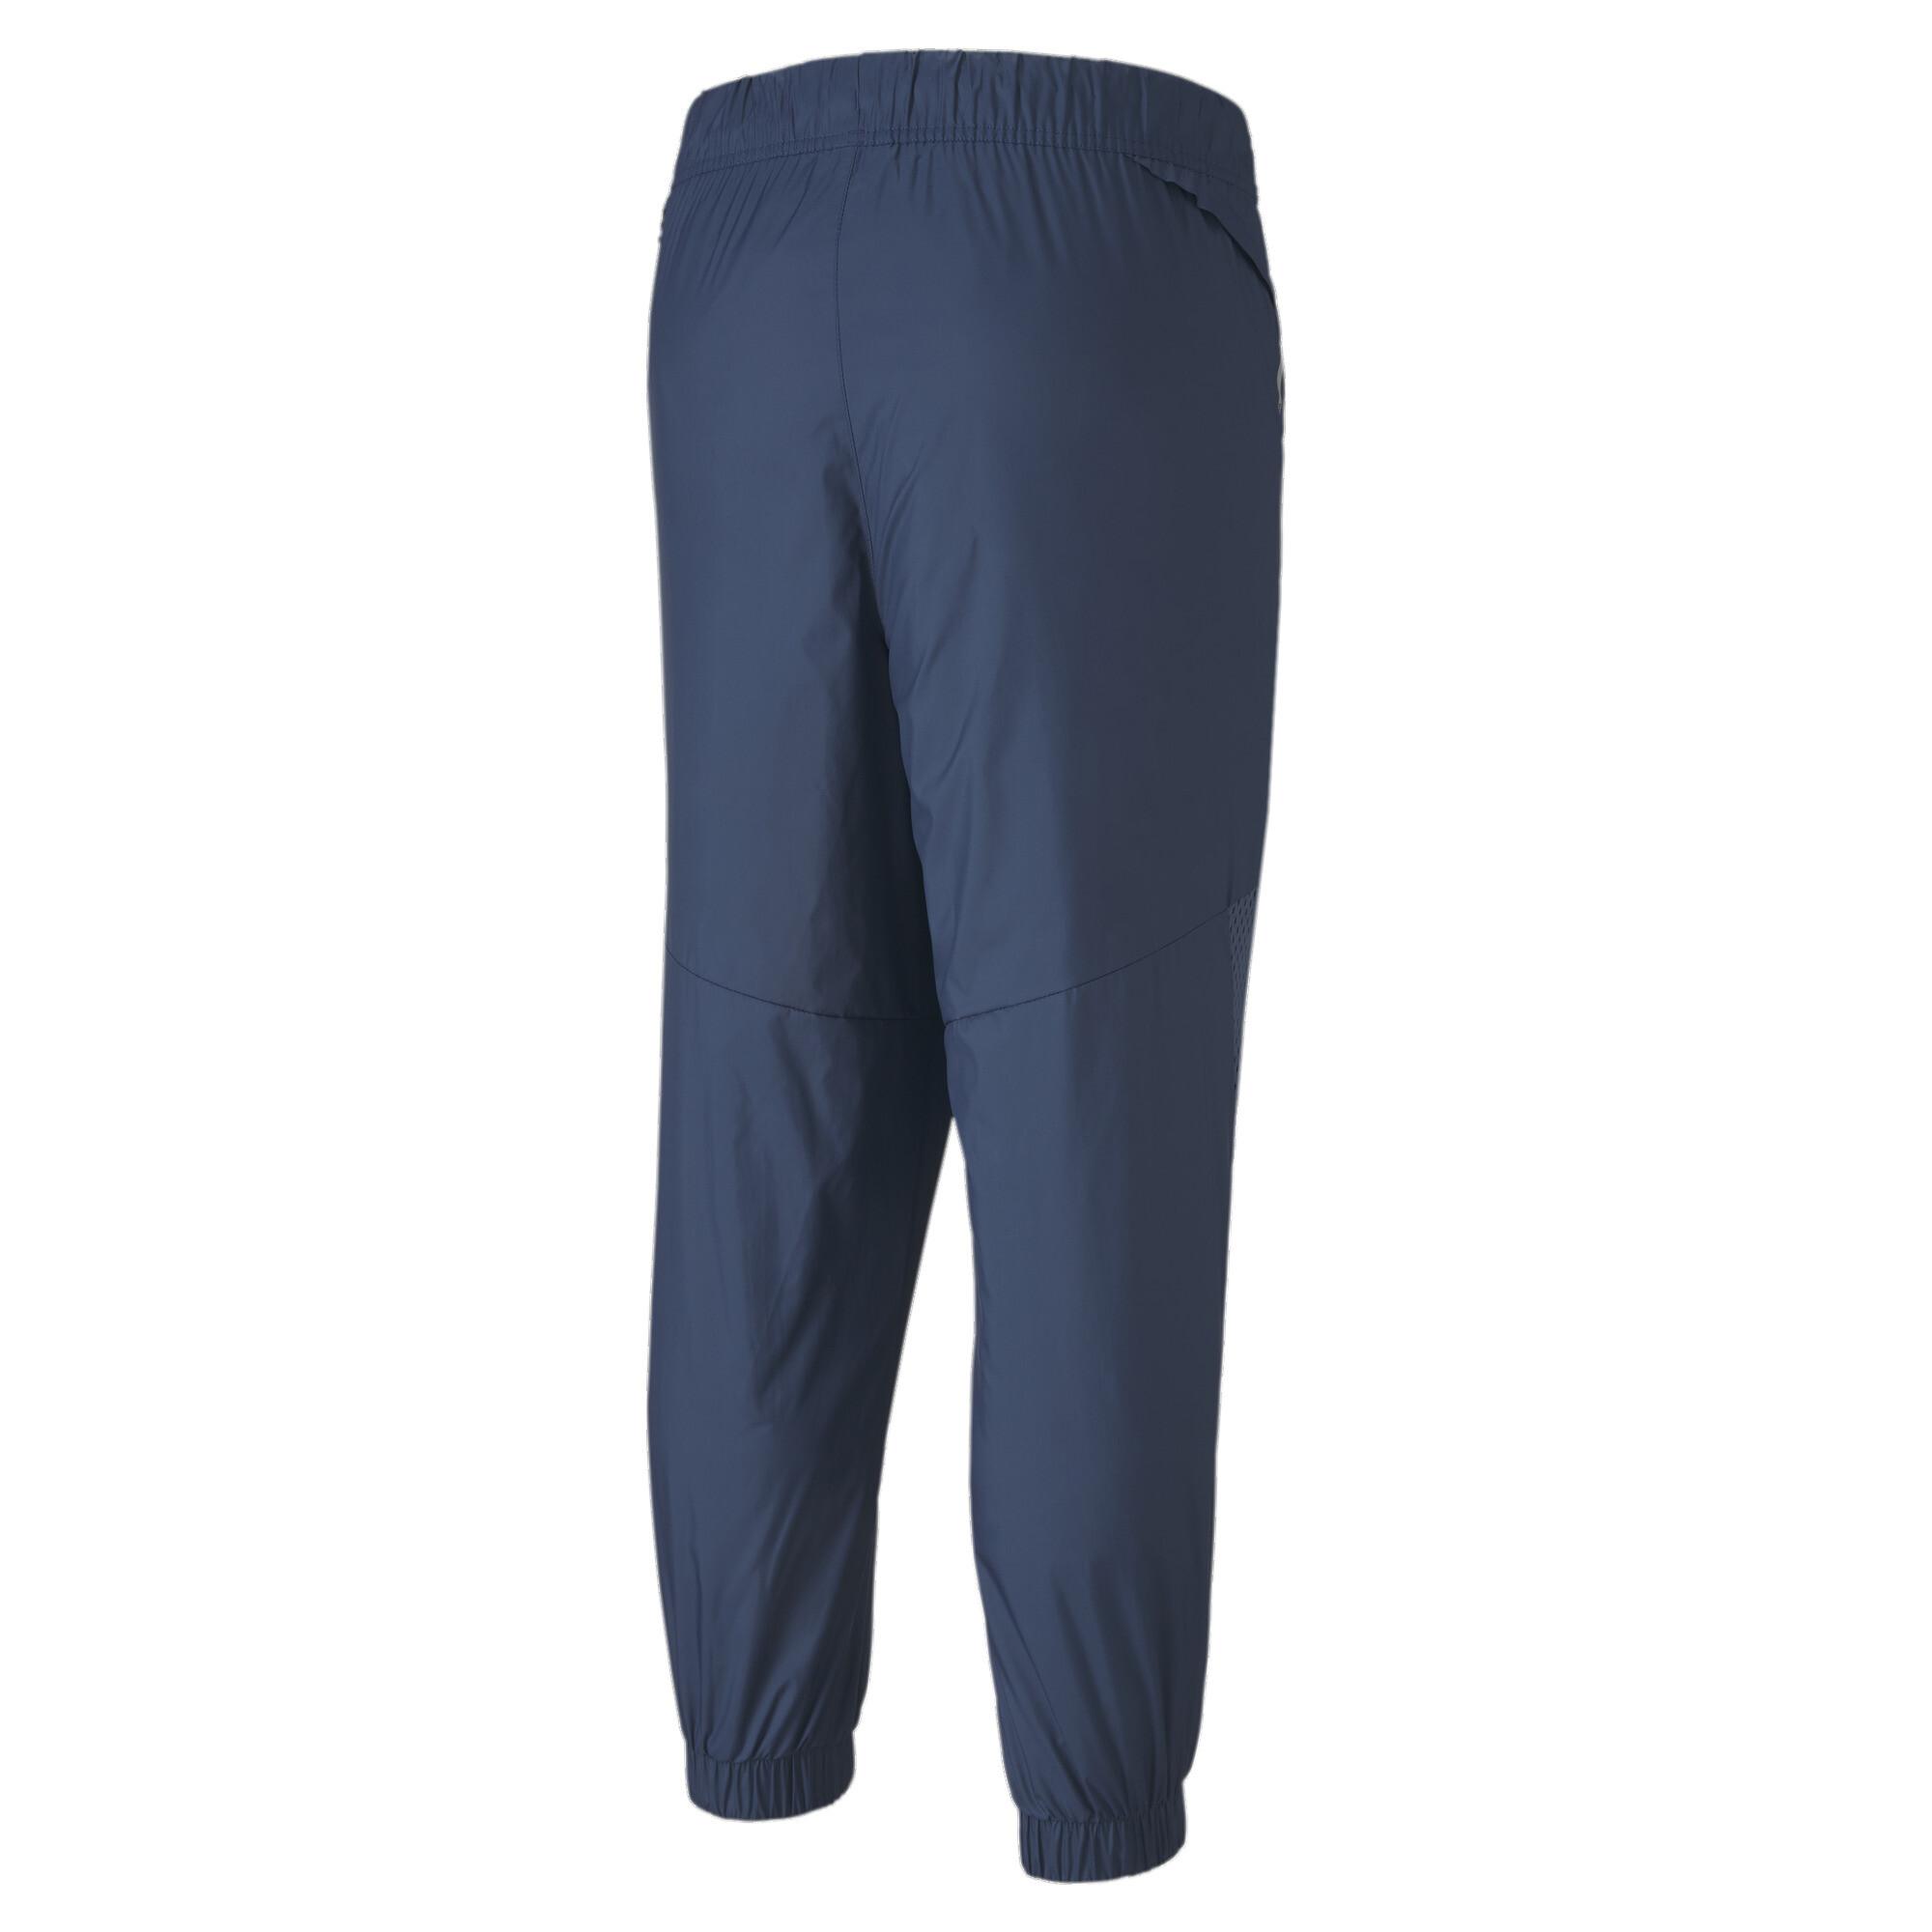 PUMA-Reactive-Men-039-s-Woven-Training-Pants-Men-Woven-Pants-Training thumbnail 8